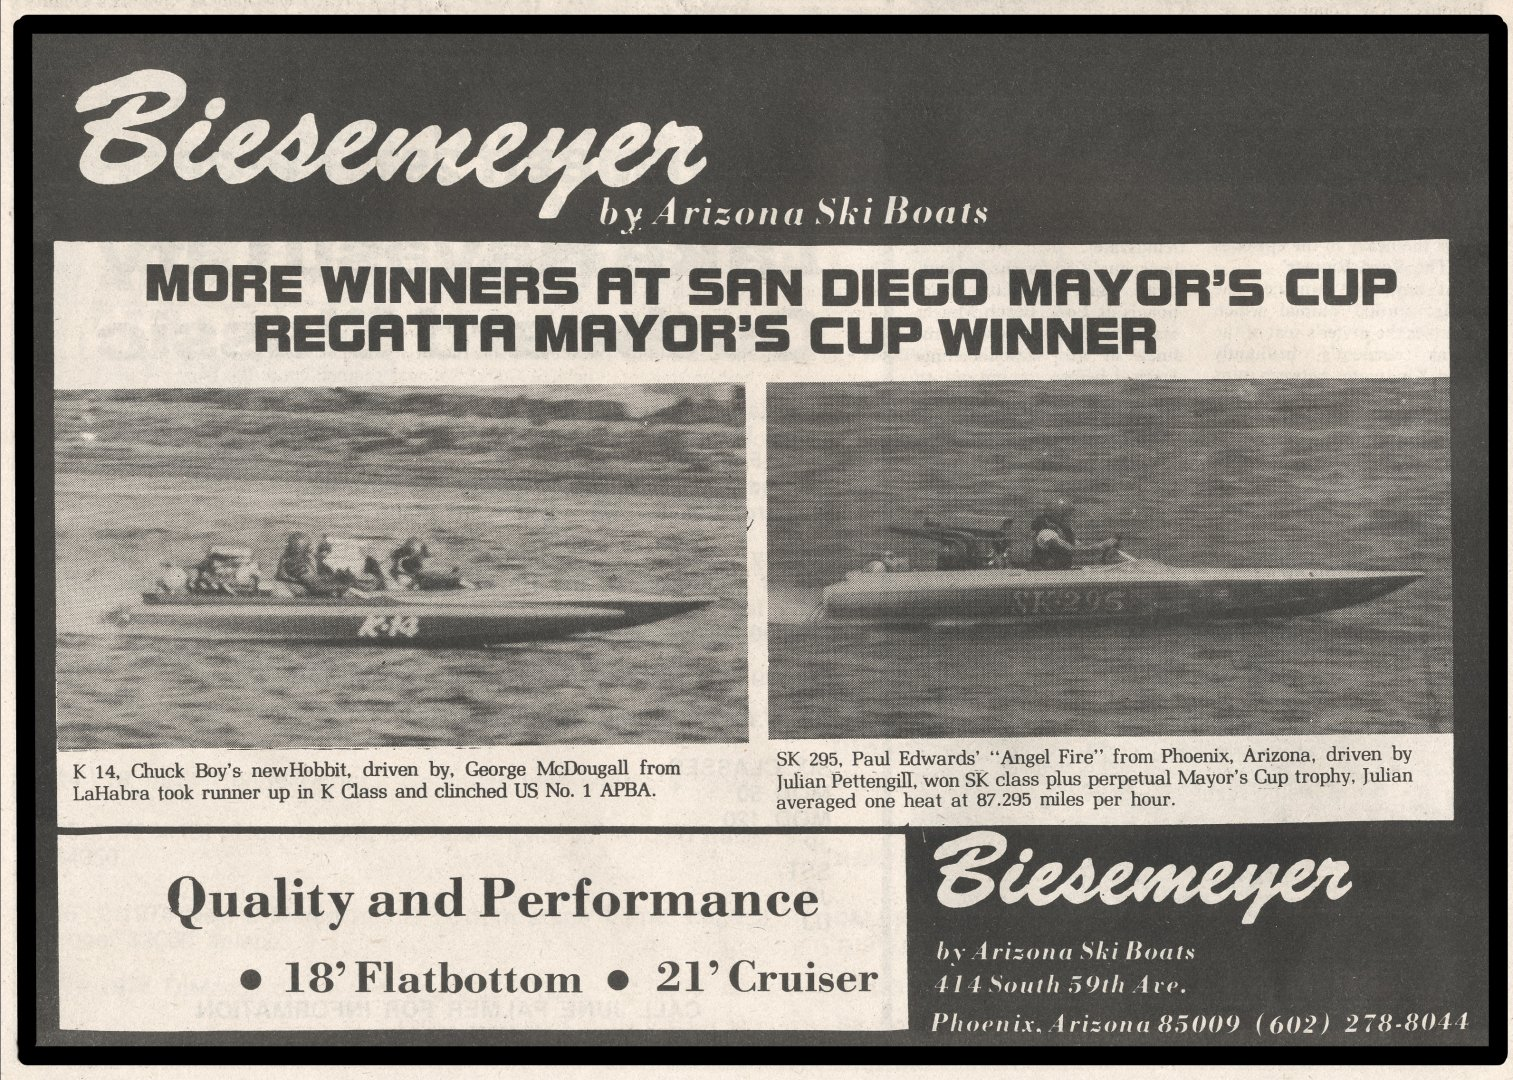 Biesemeyer Ad Race Boat and Industry News Nov 1975.jpg